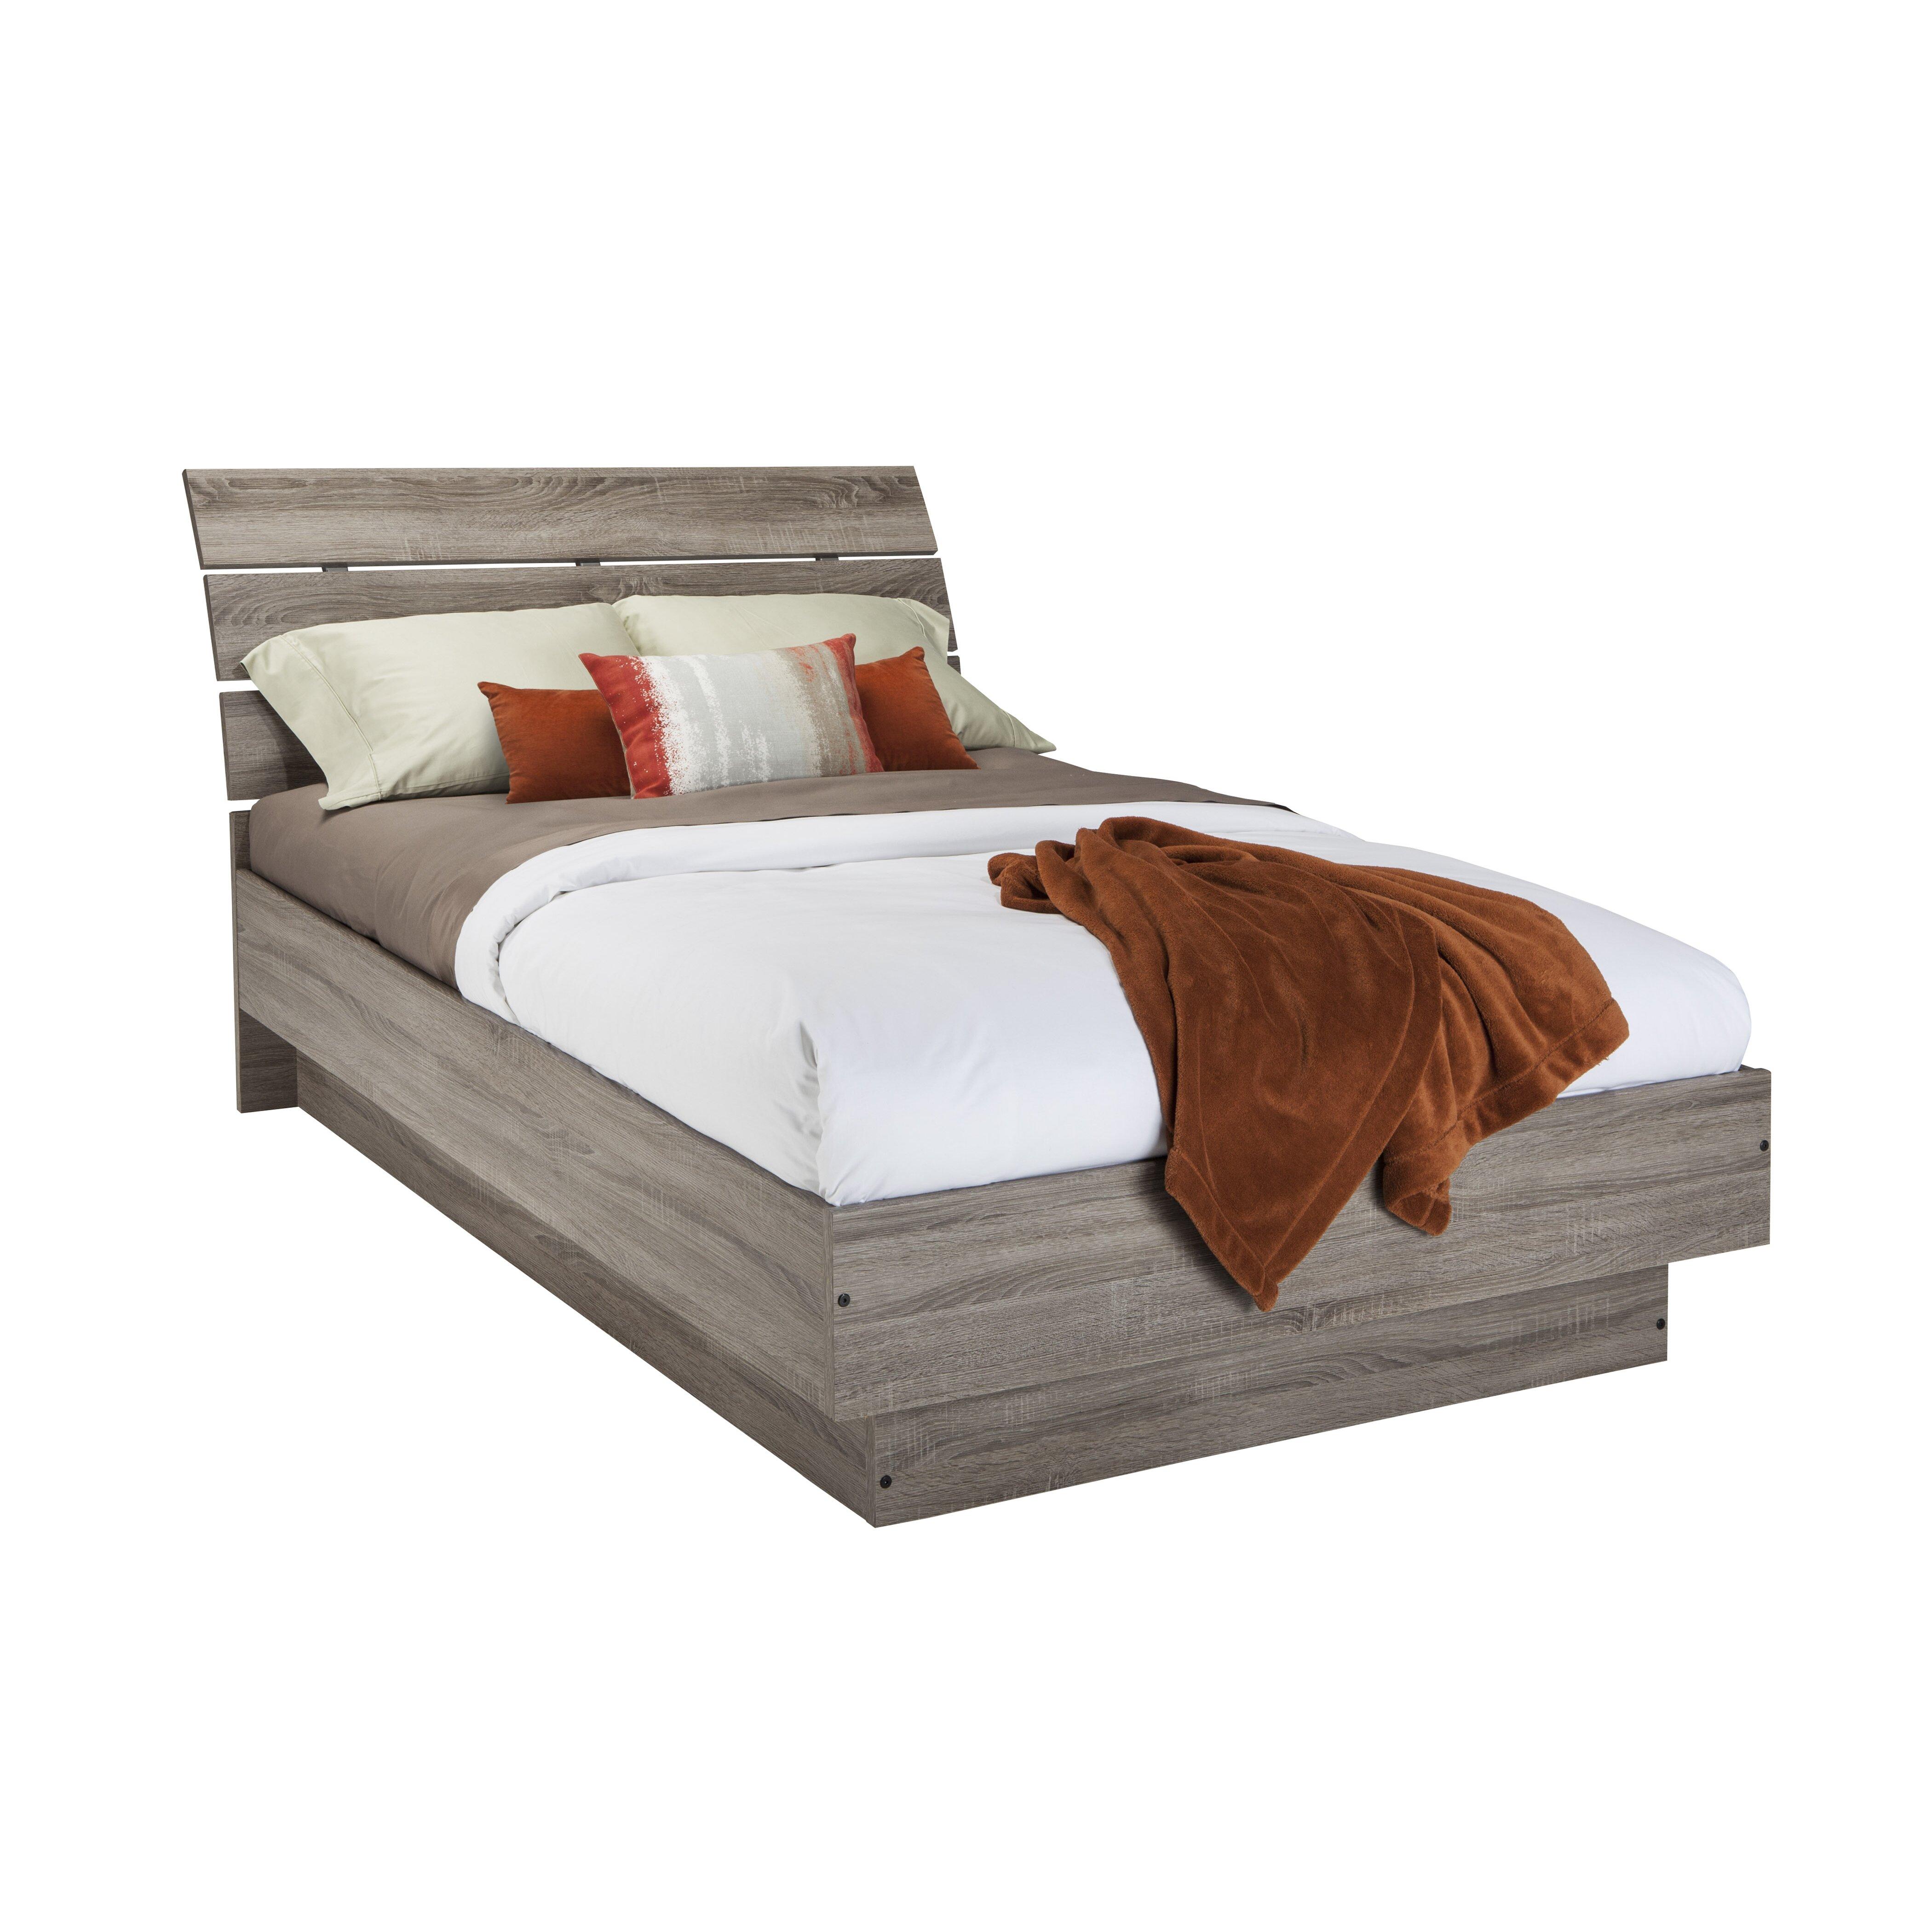 Varick gallery west oak lane platform bed reviews wayfair - Oak platform beds ...